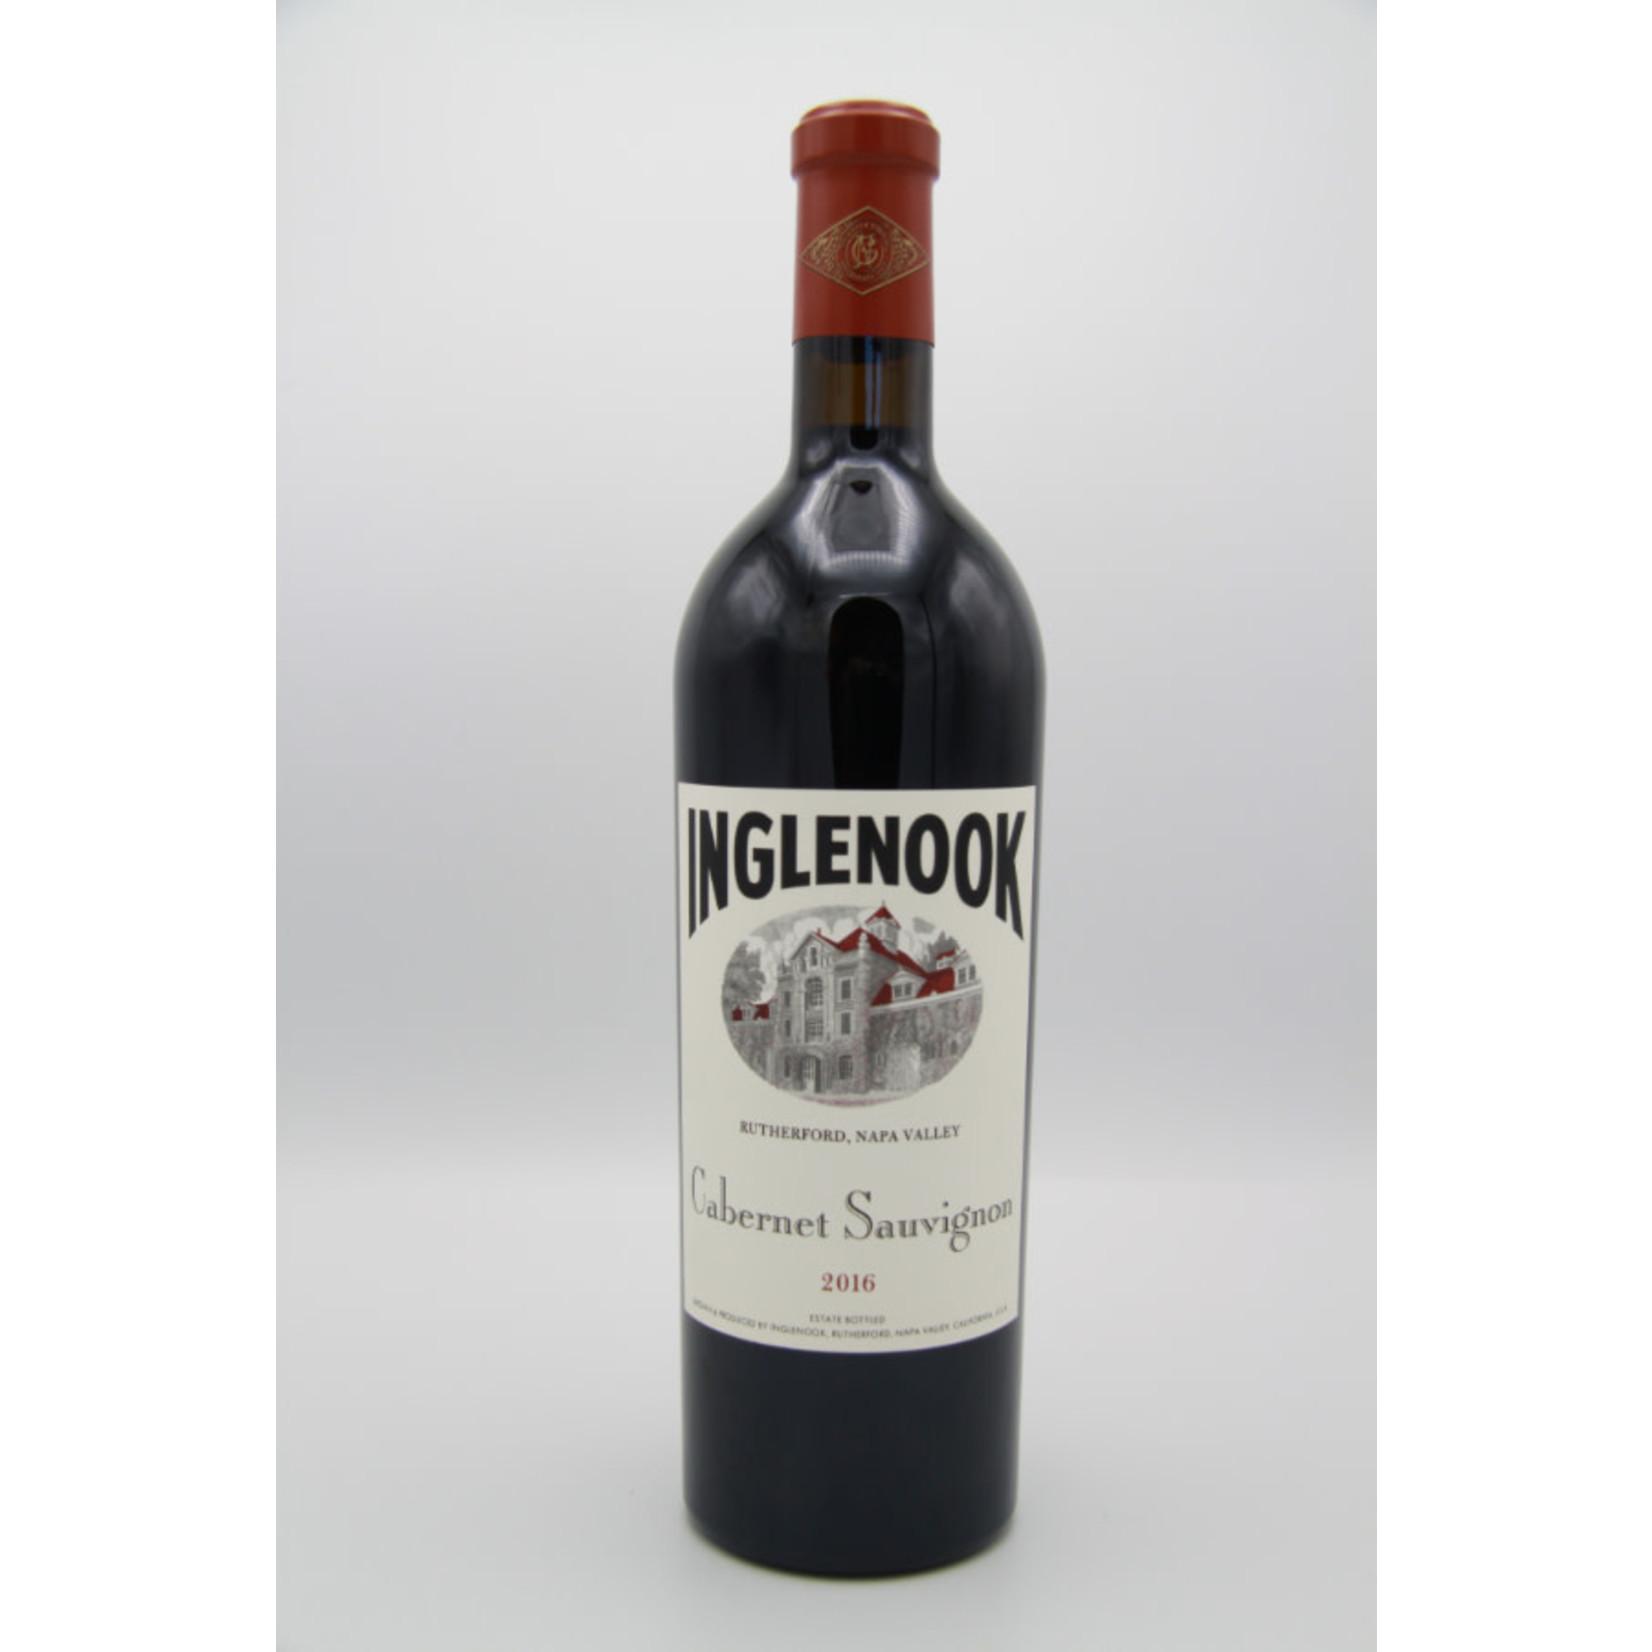 2016 Inglenook Cabernet Sauvignon